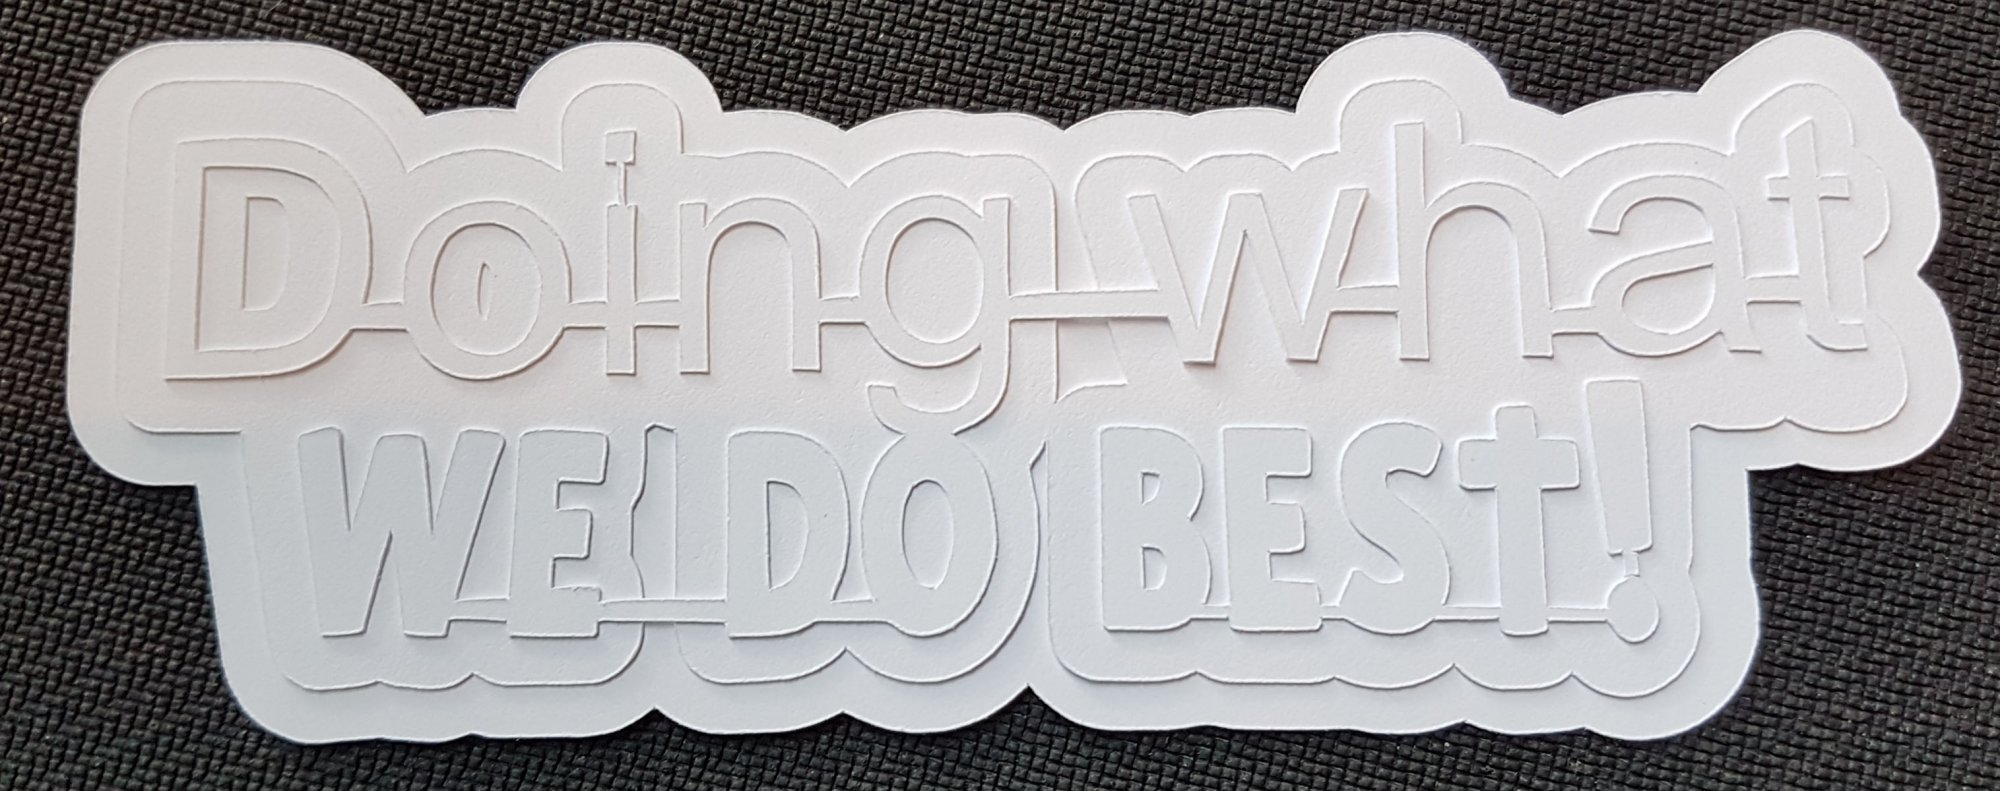 Media Titles - Doing What We Do Best (NB)